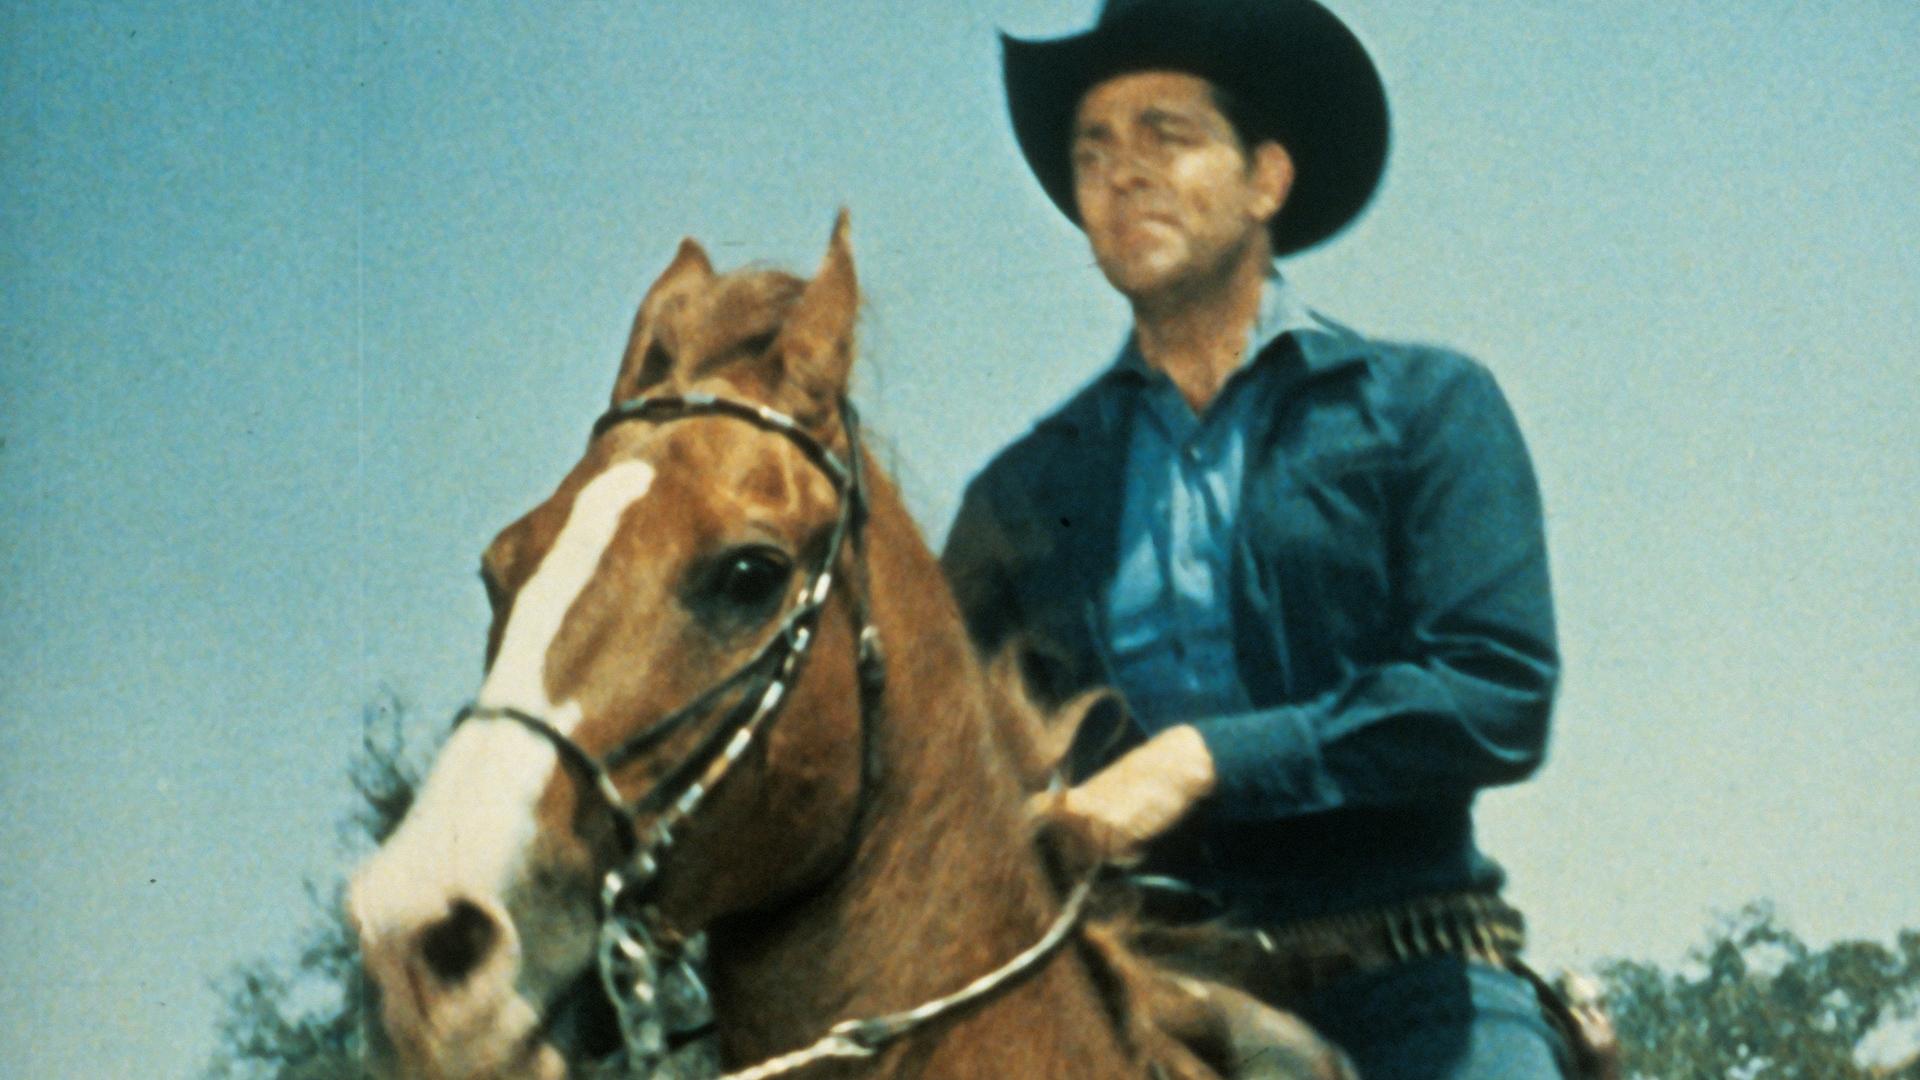 Gunfight in Black Horse Canyon